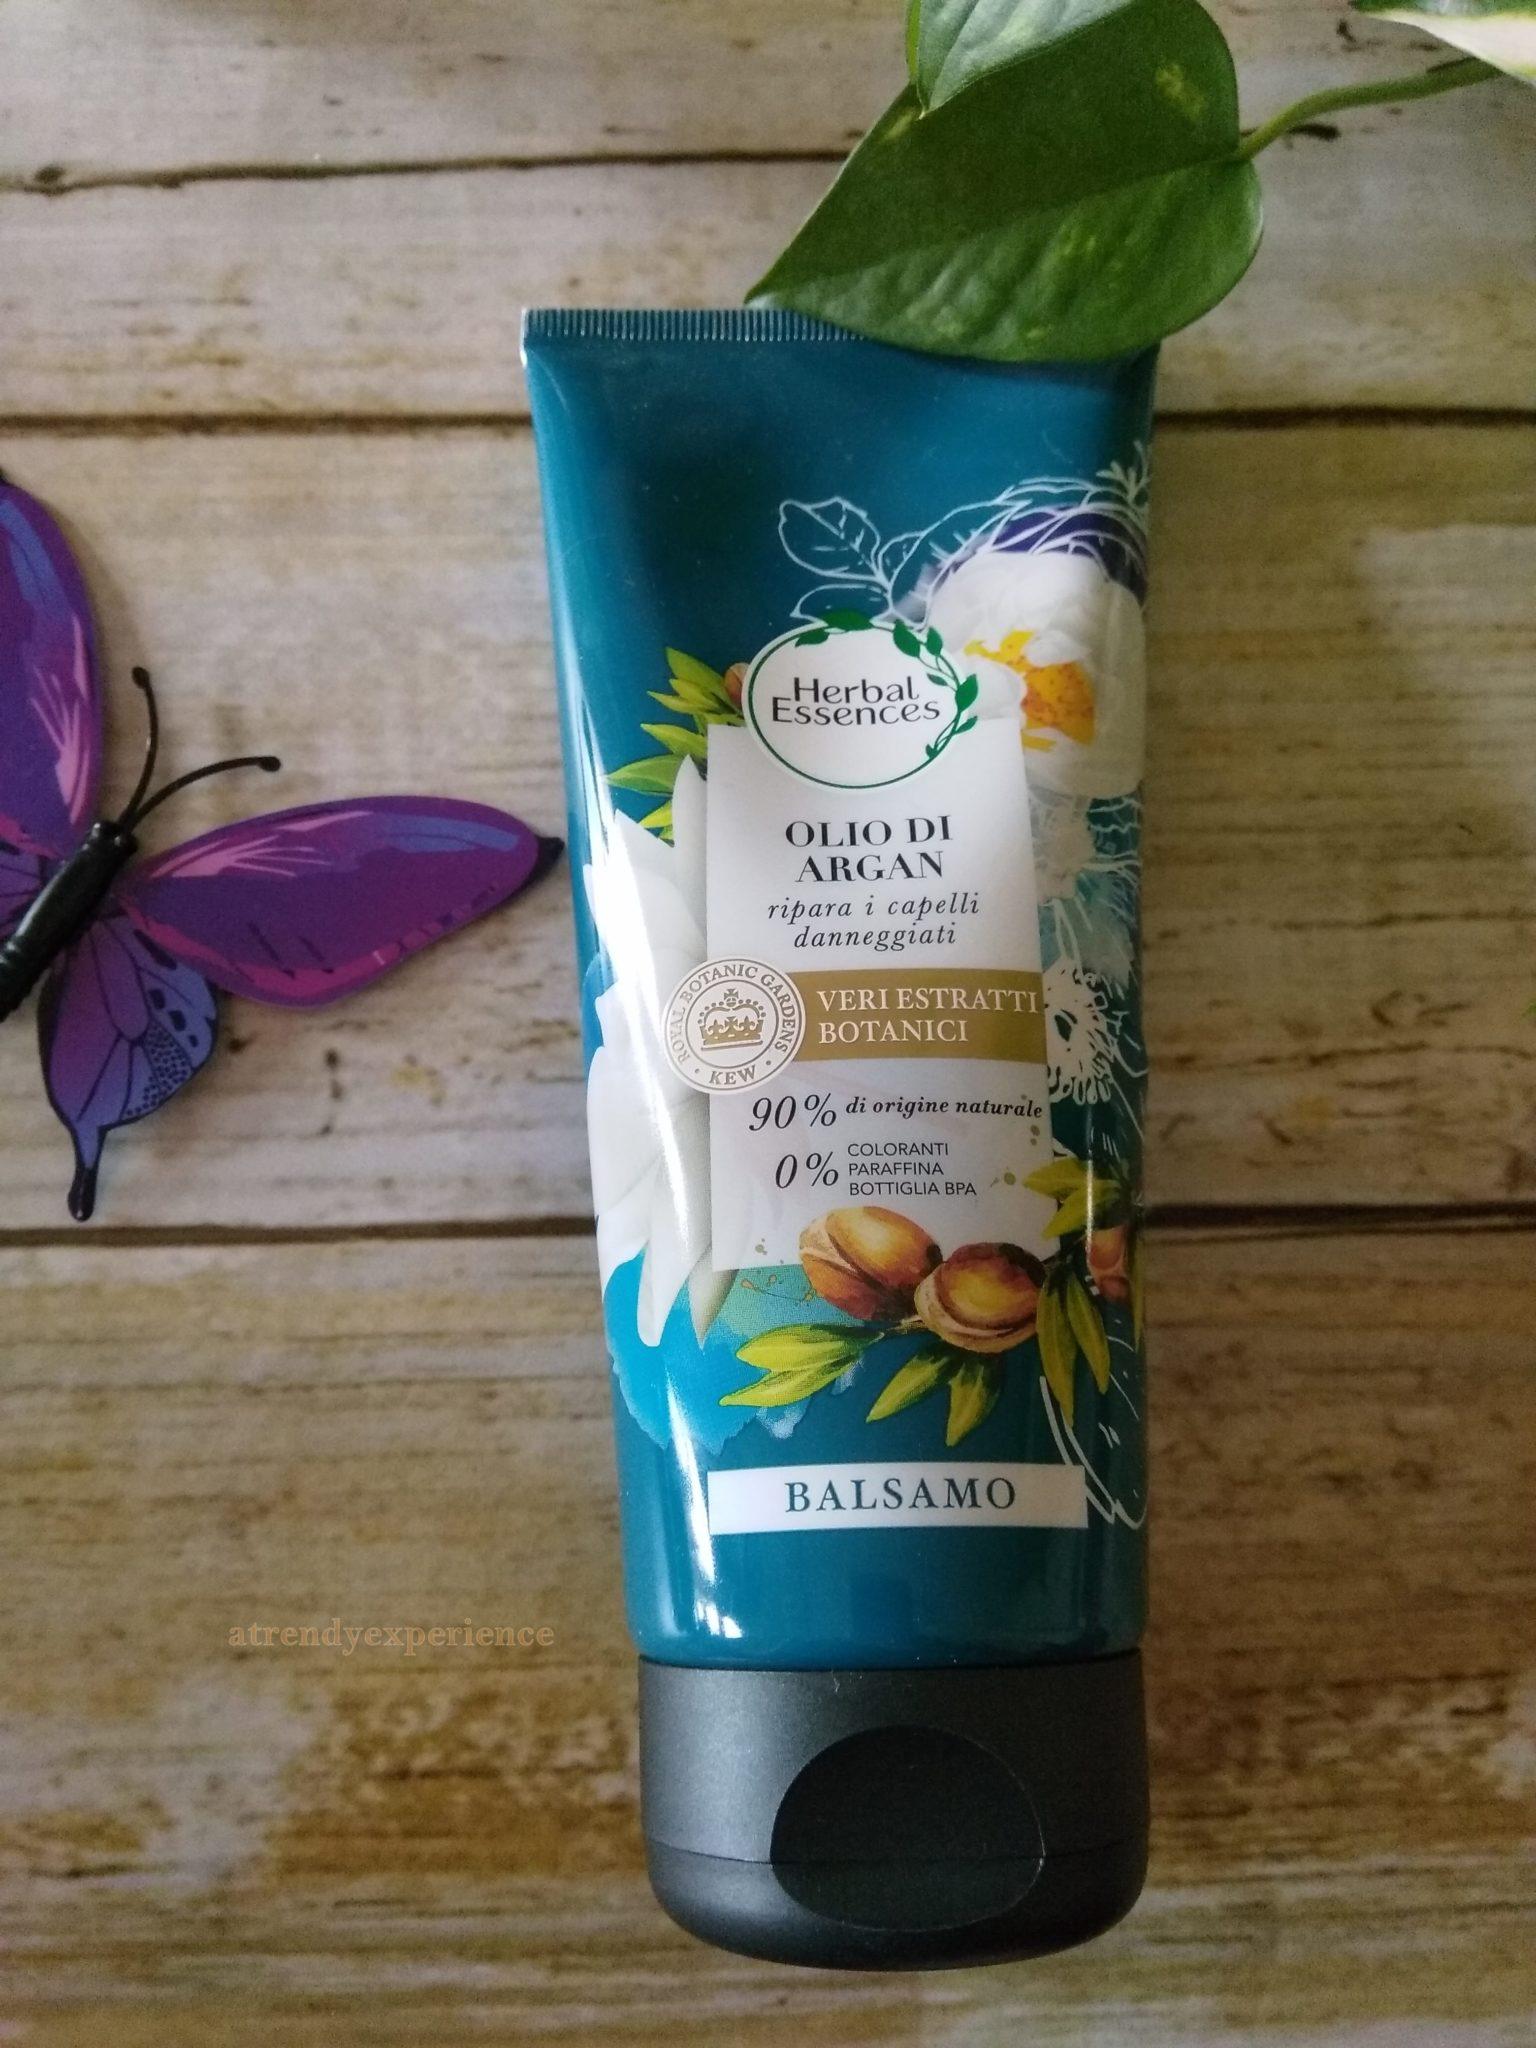 balsamo herbal essences olio di argan